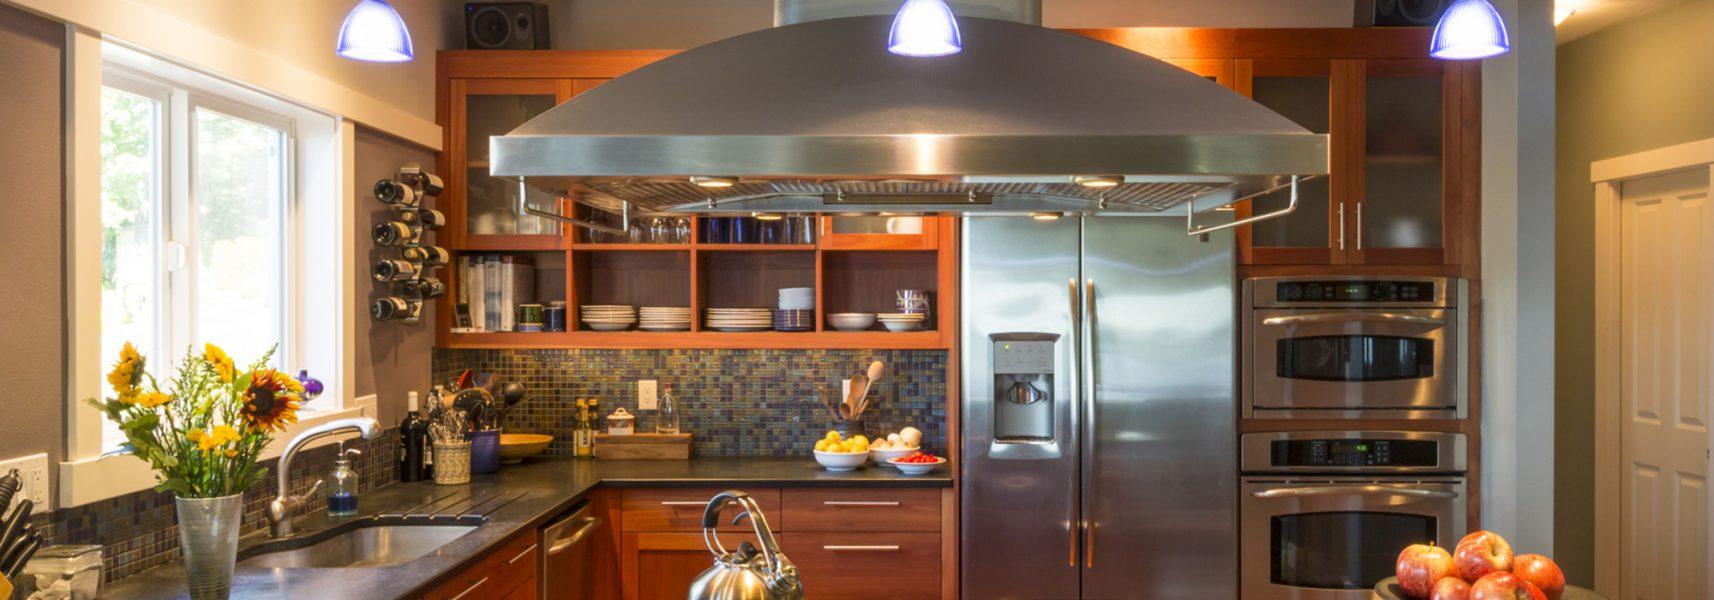 Elettrodomestici utili in cucina cucine padova - Disposizione elettrodomestici cucina ...